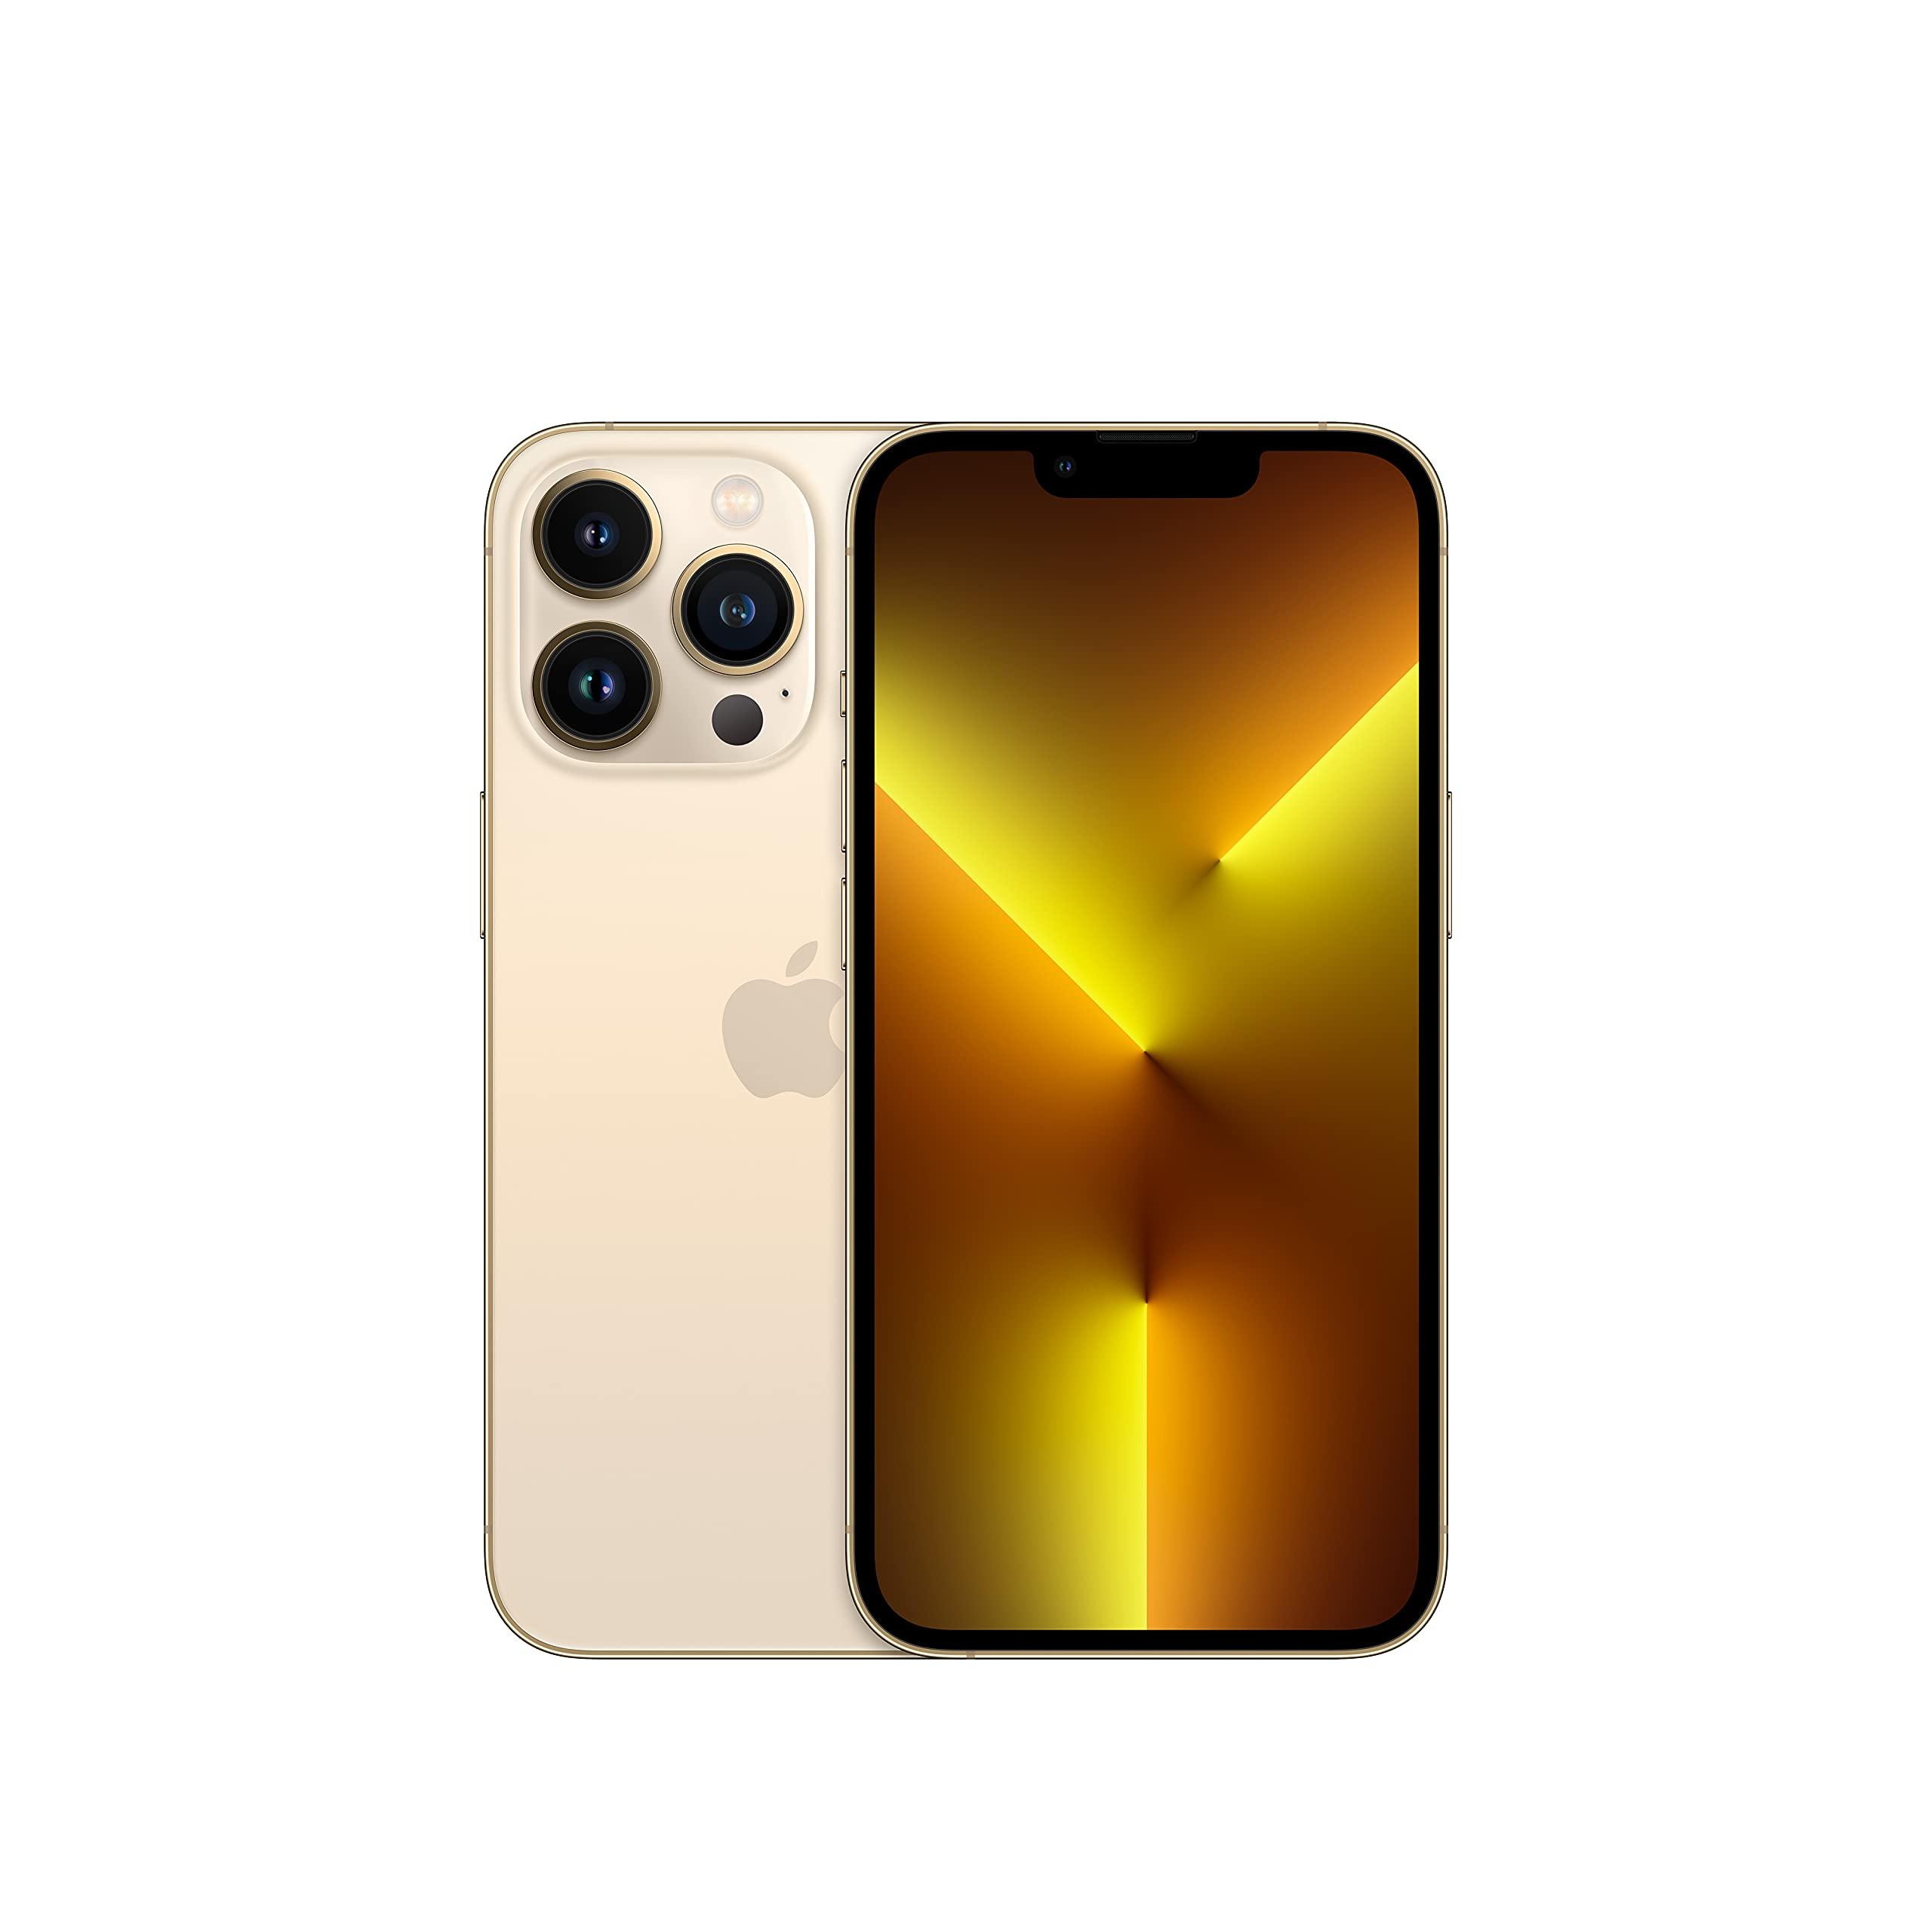 Apple iPhone 13 Pro (256GB) - Gold